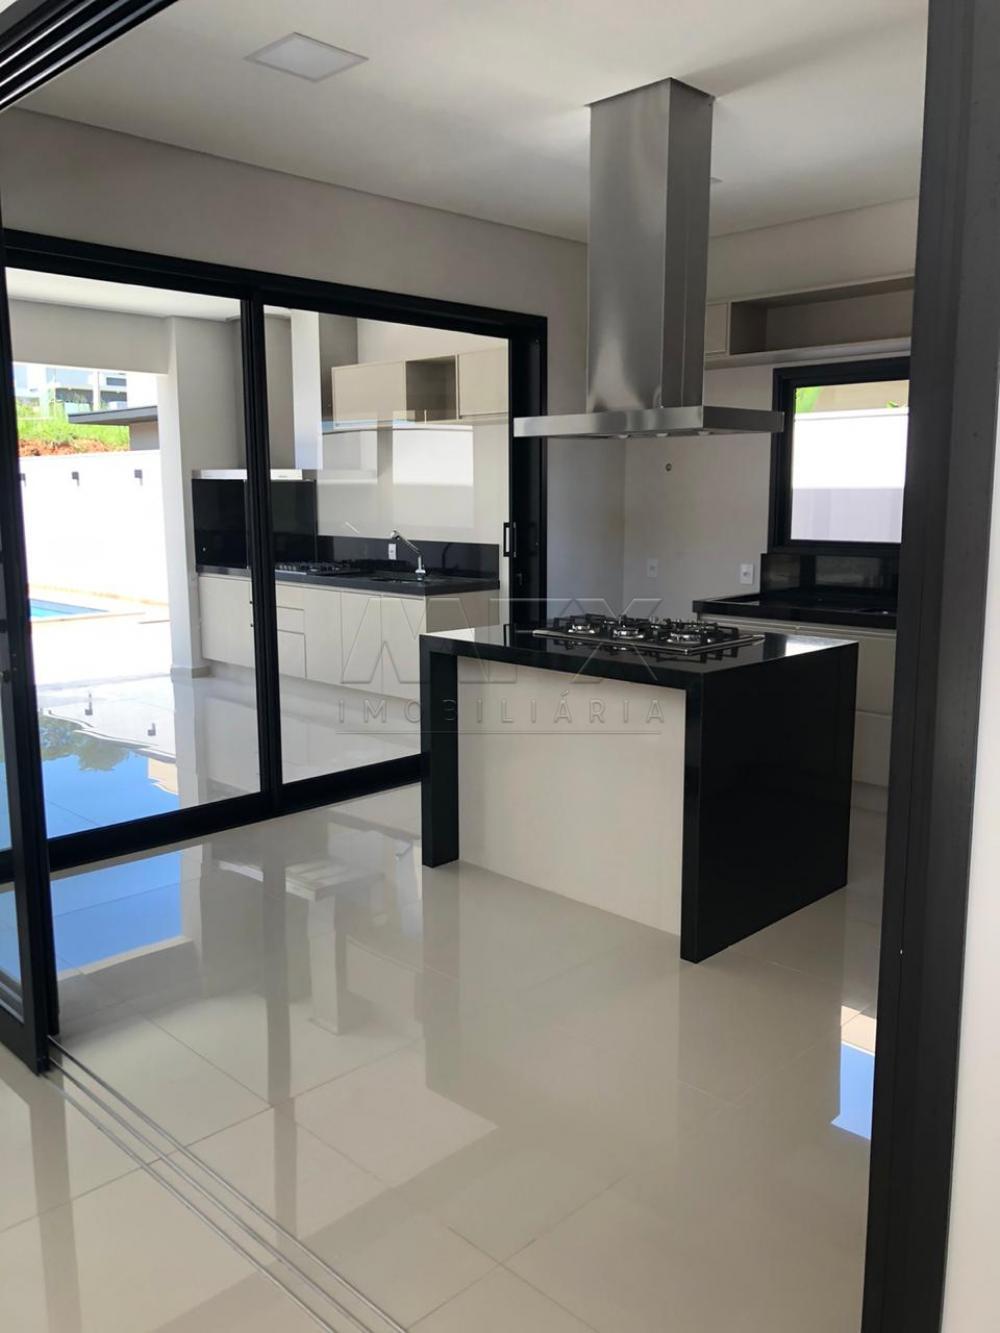 Comprar Casa / Condomínio em Bauru apenas R$ 1.600.000,00 - Foto 5